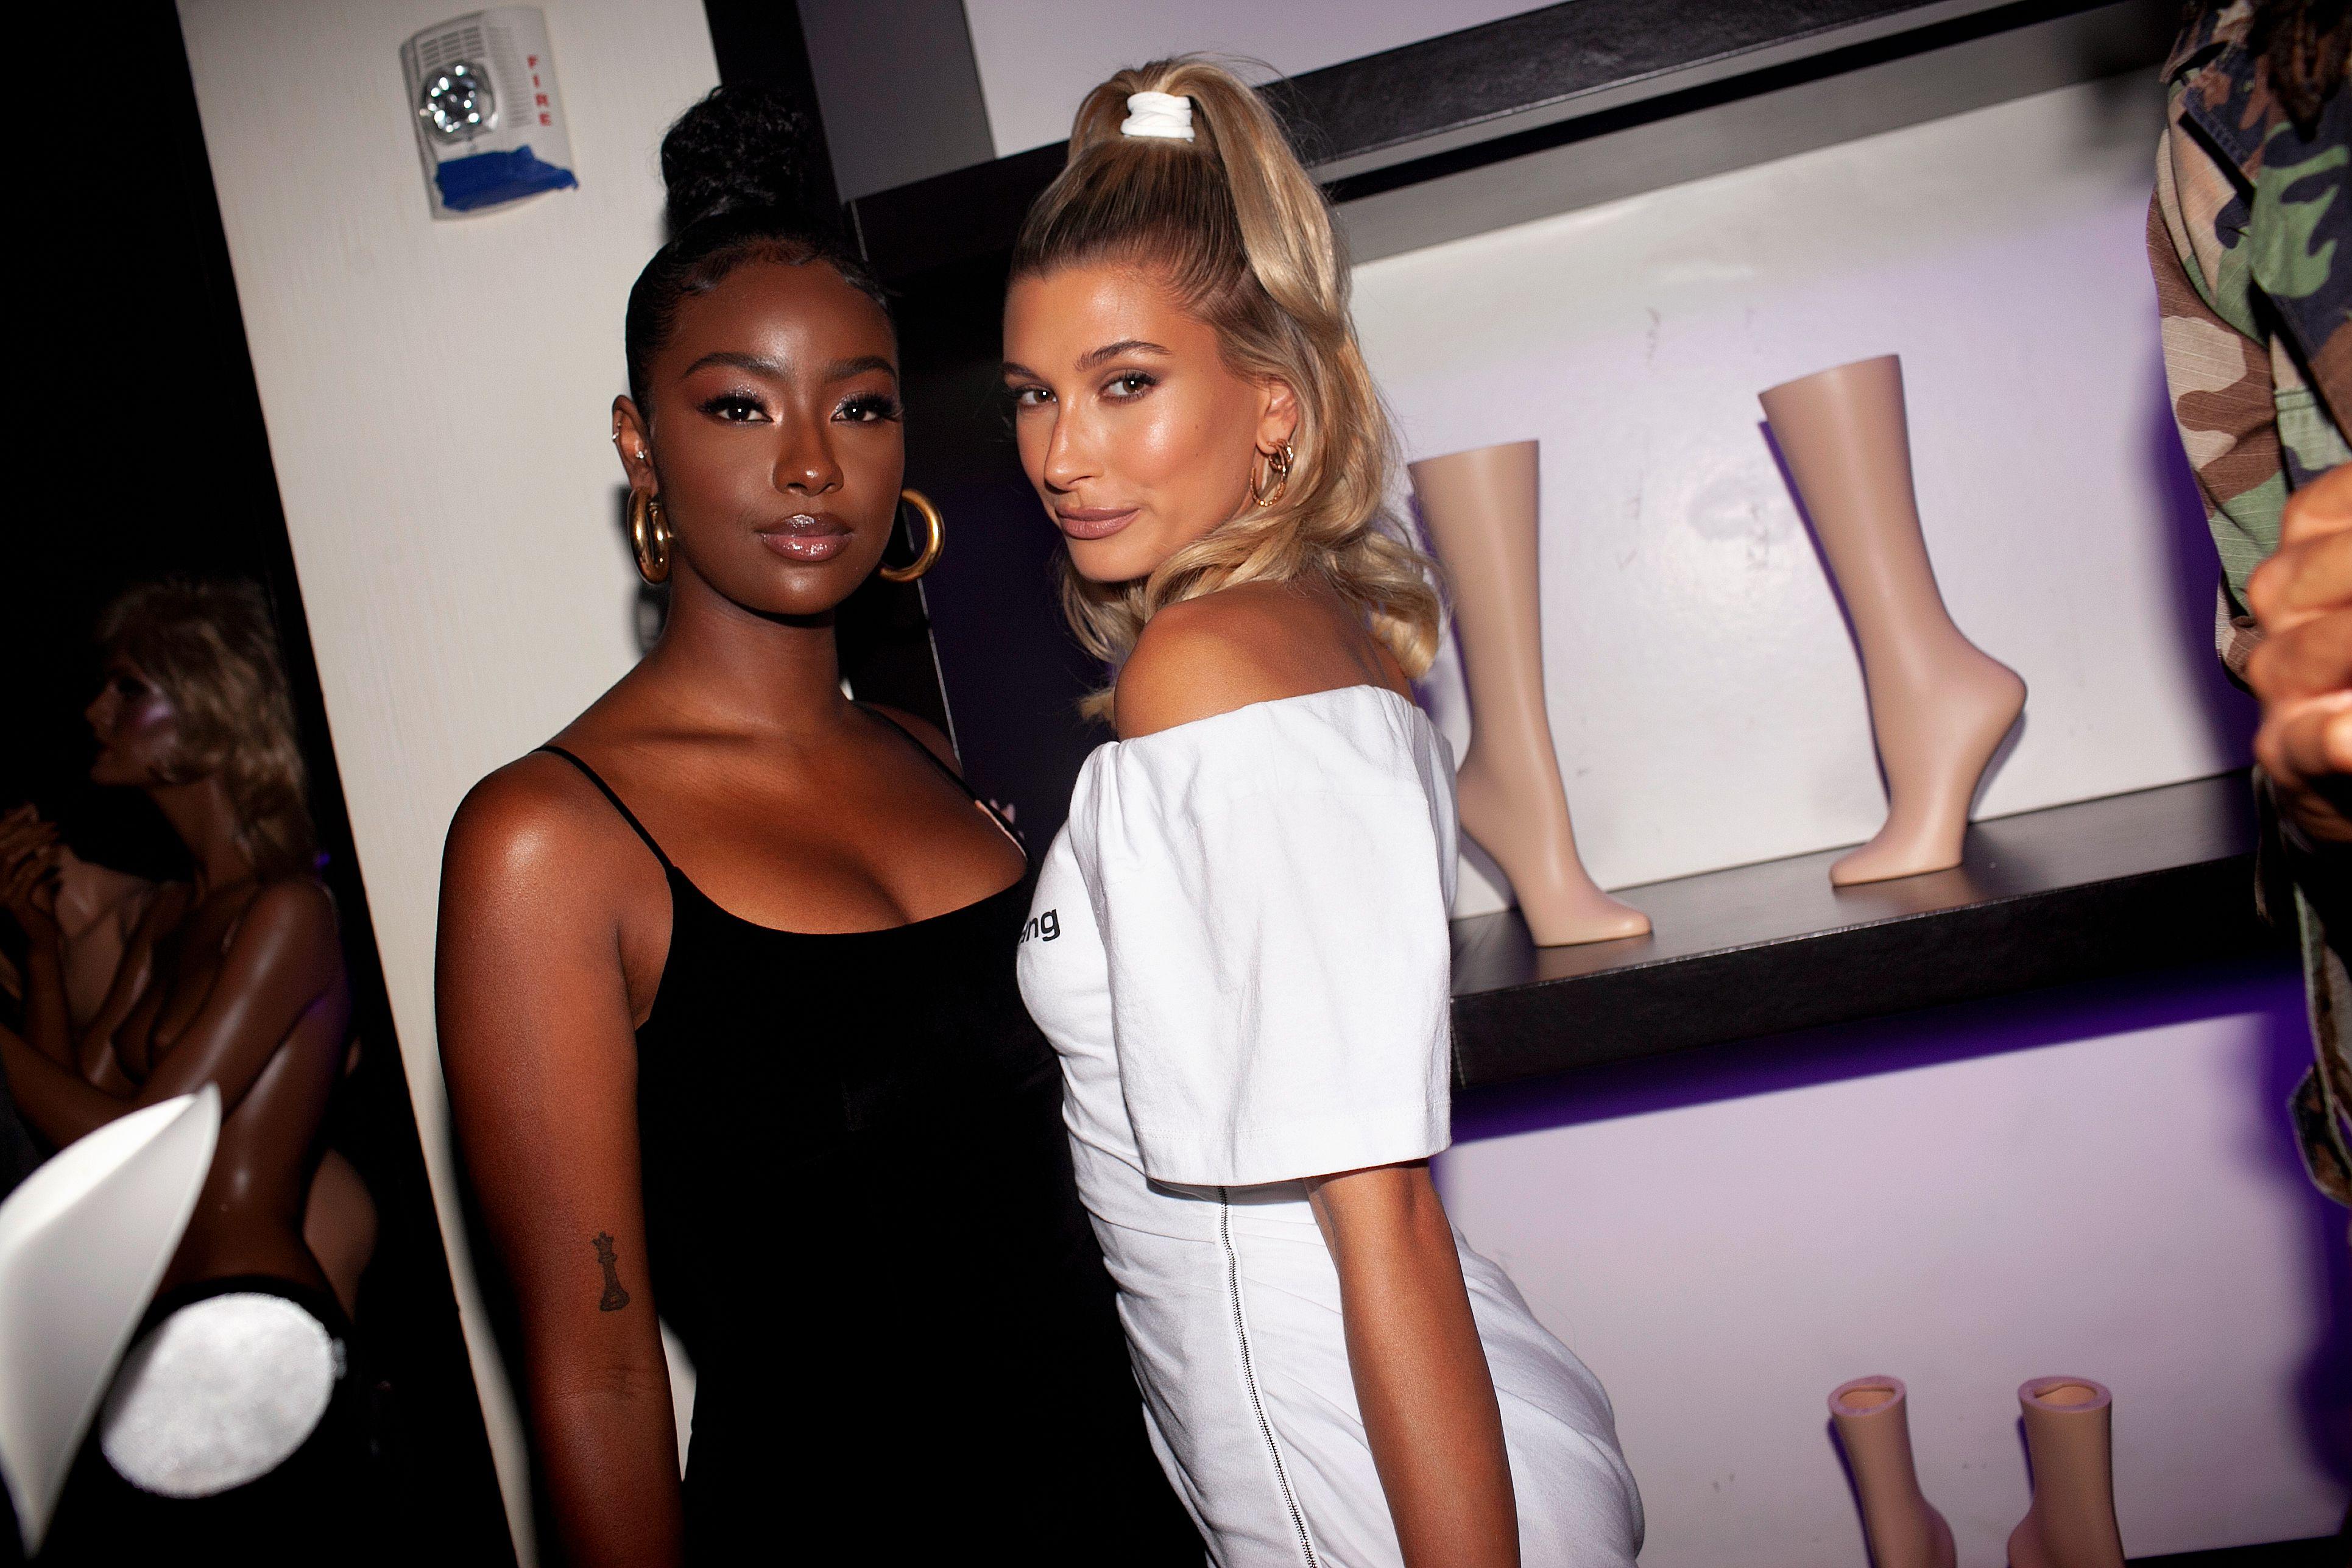 Justine Skye, Hailey BieberBVLGARI party, Spring Summer 2020, New York Fashion Week, USA - 07 Sep 2019